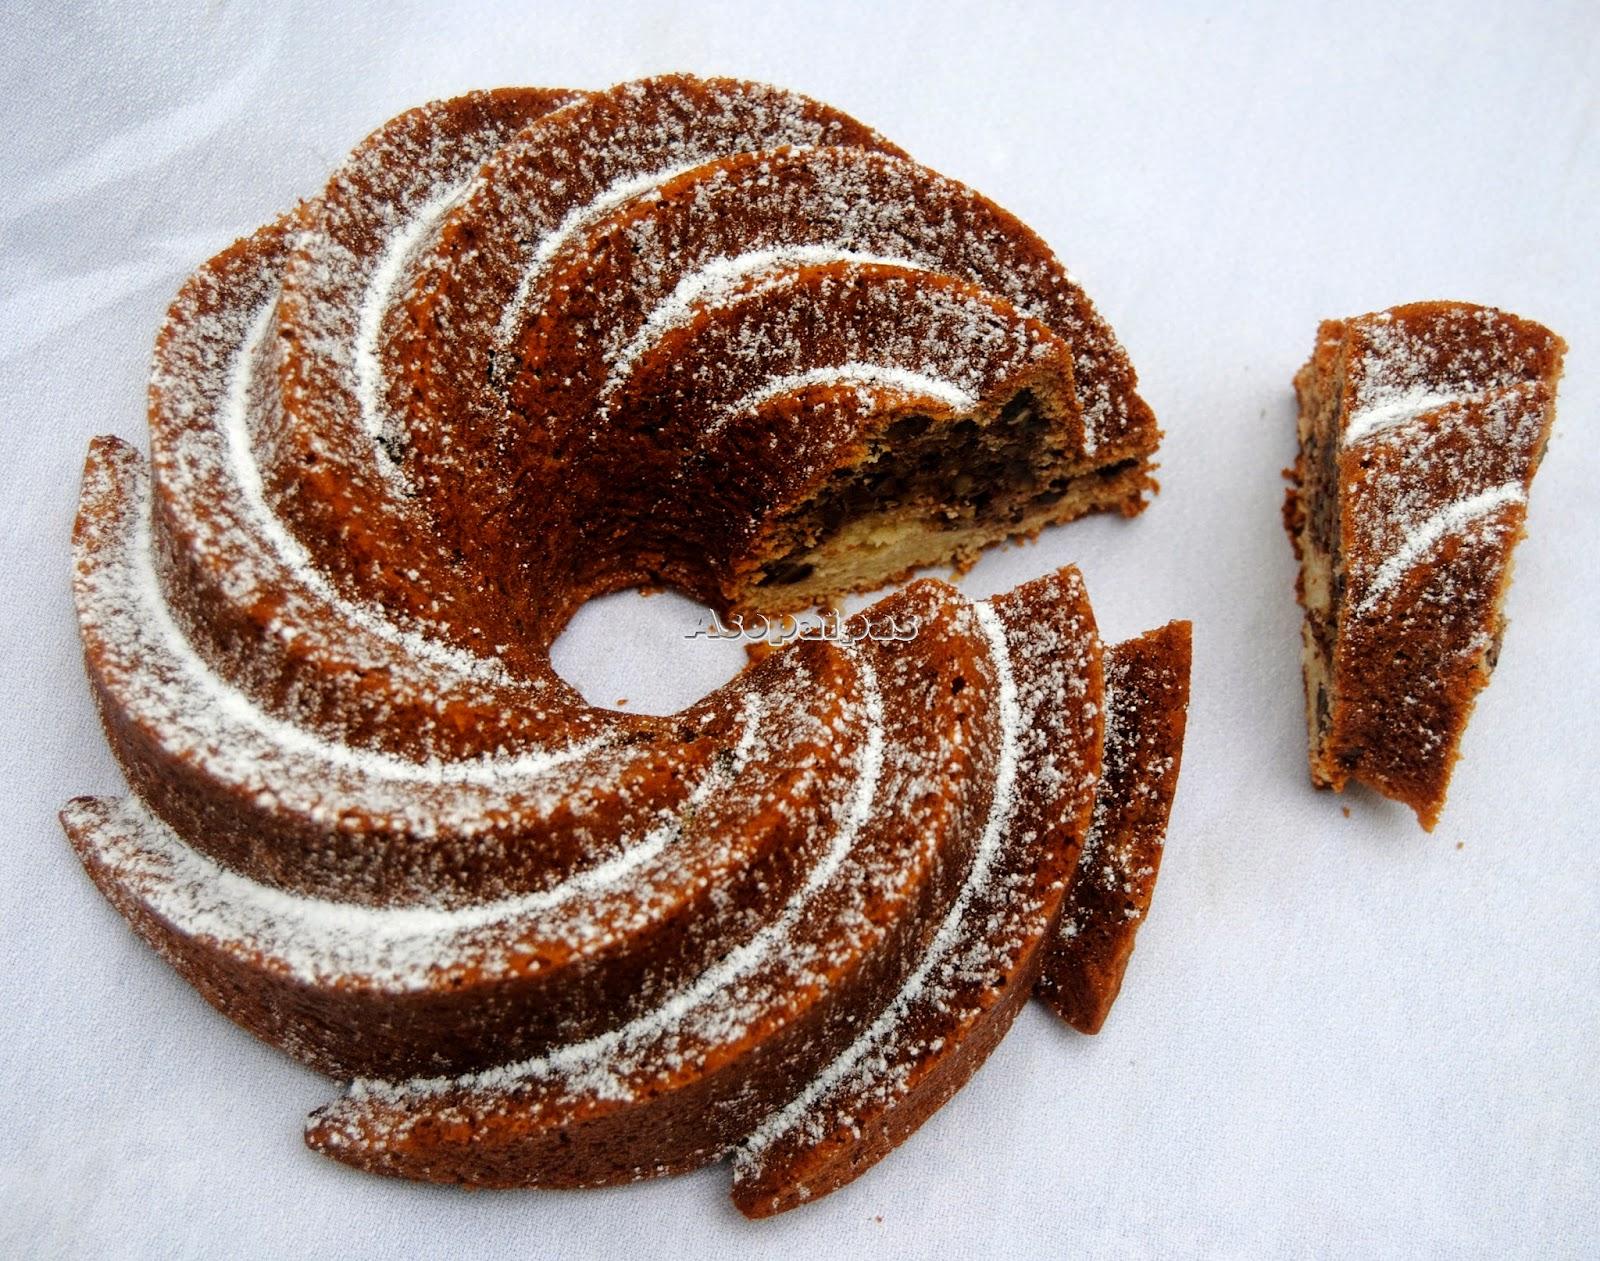 Bundt Cake de Jarabe de Arce y Pecanas (Maple Pecan Bundt Cake)